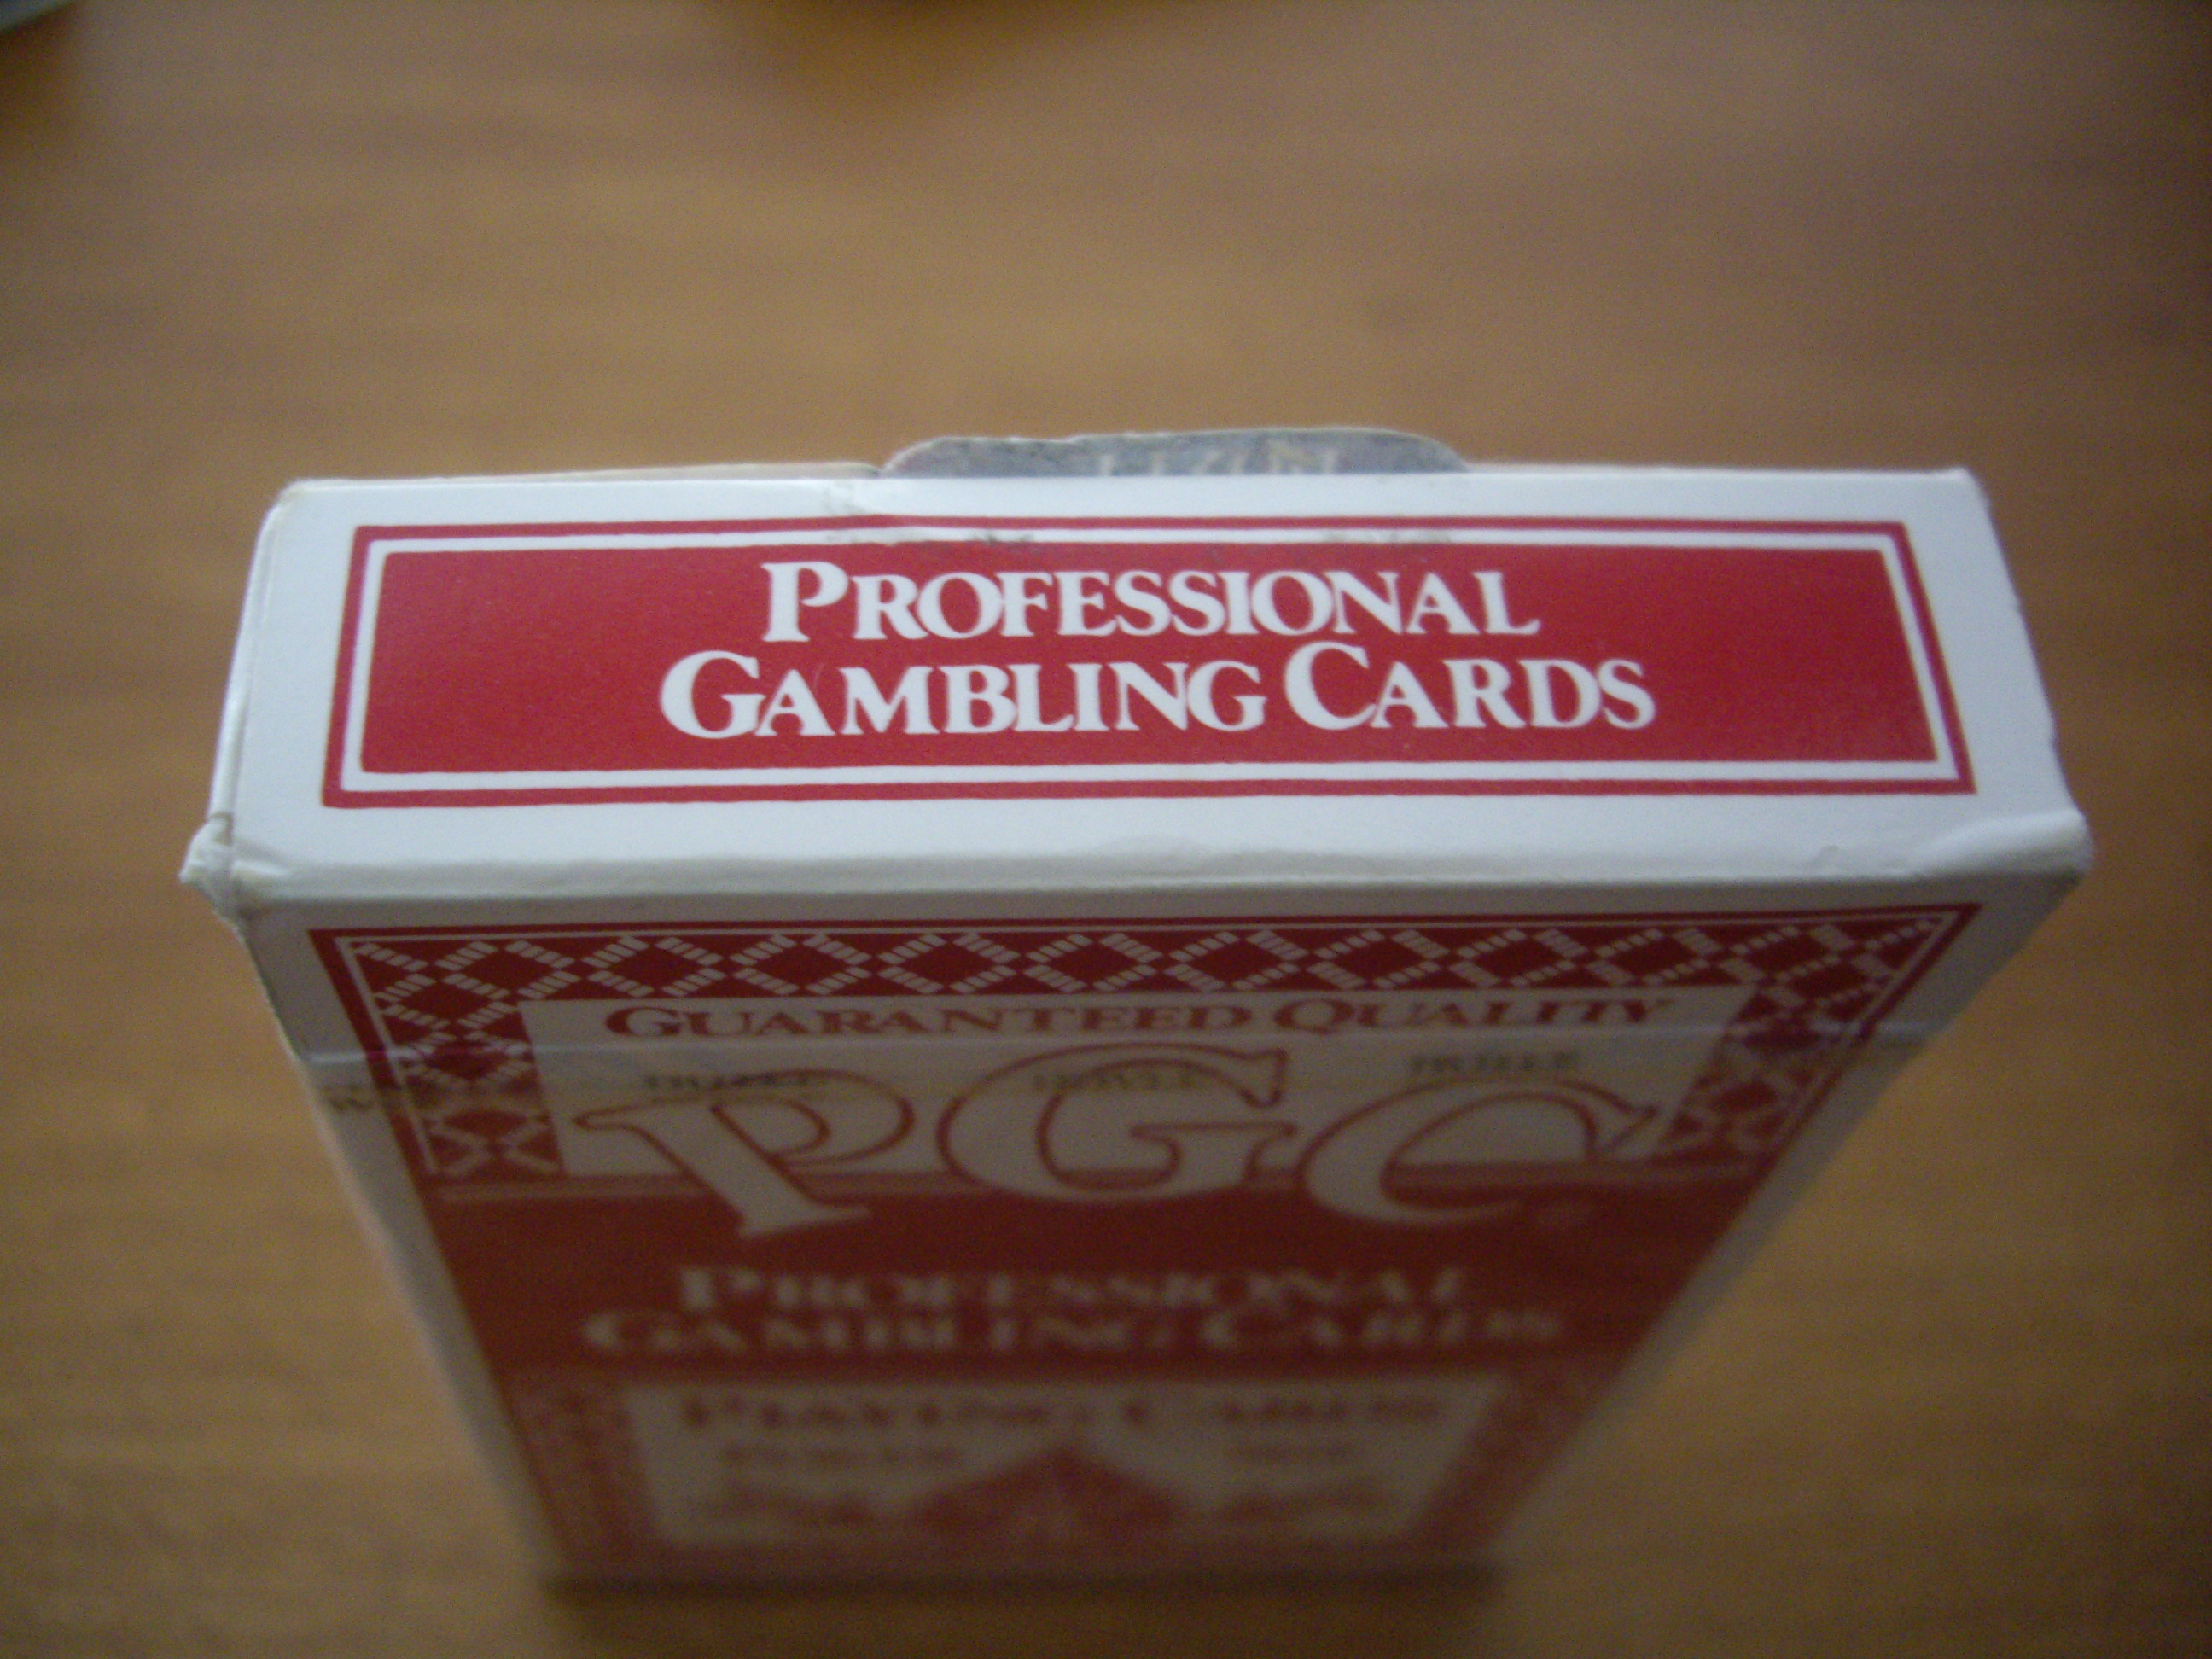 Pgc gambling cards